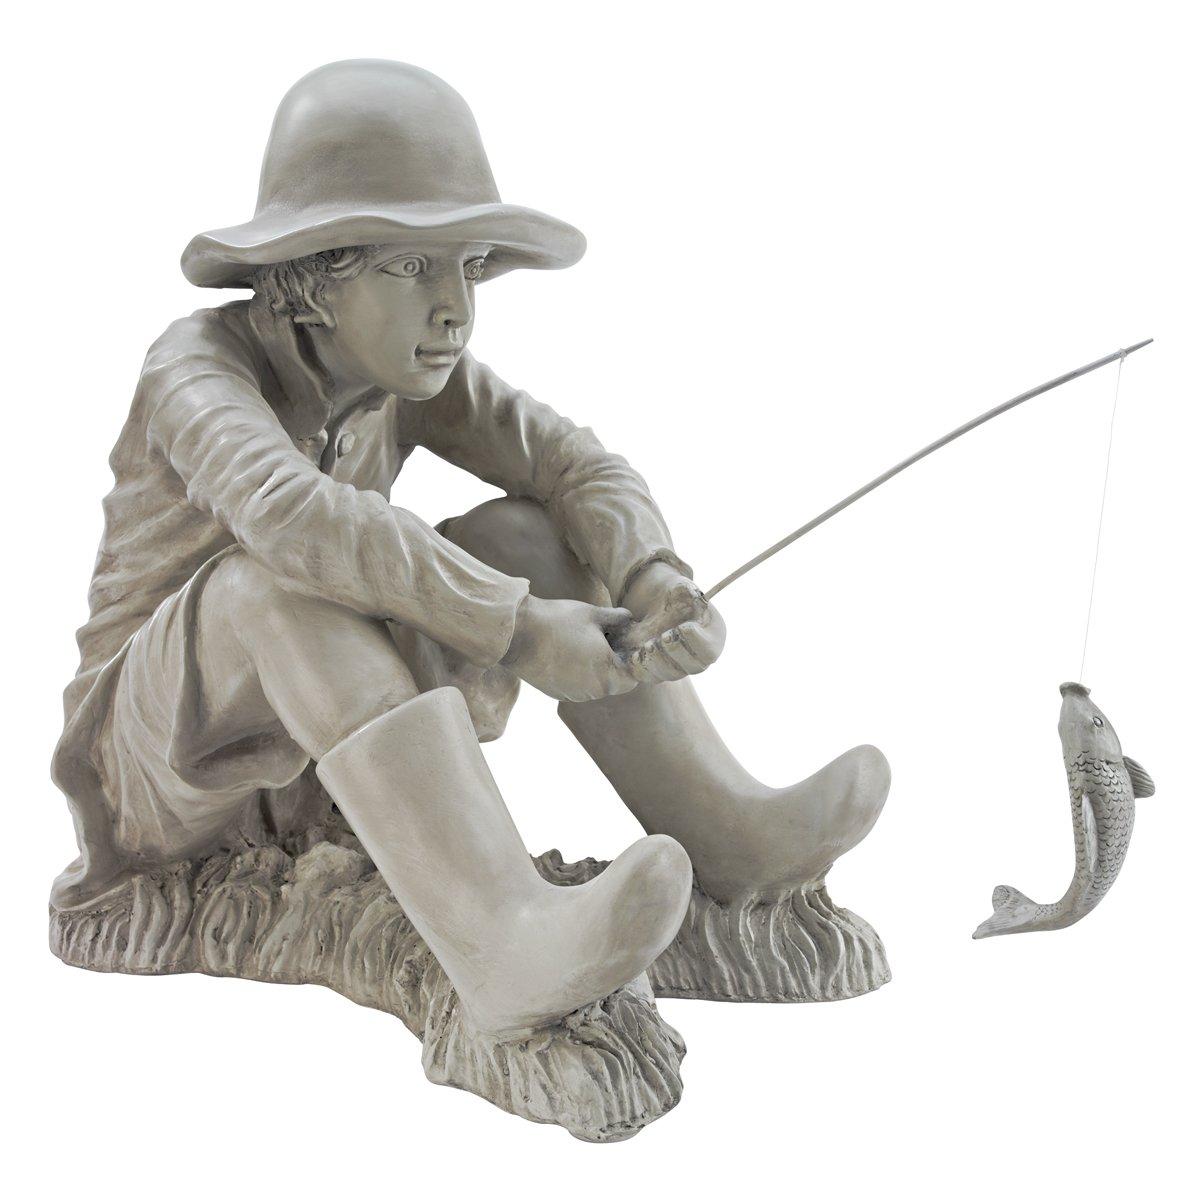 Design Toscano Gone Fishing Fisherman Boy Garden Statue, 17 Inch, Polyresin, Two Tone Stone